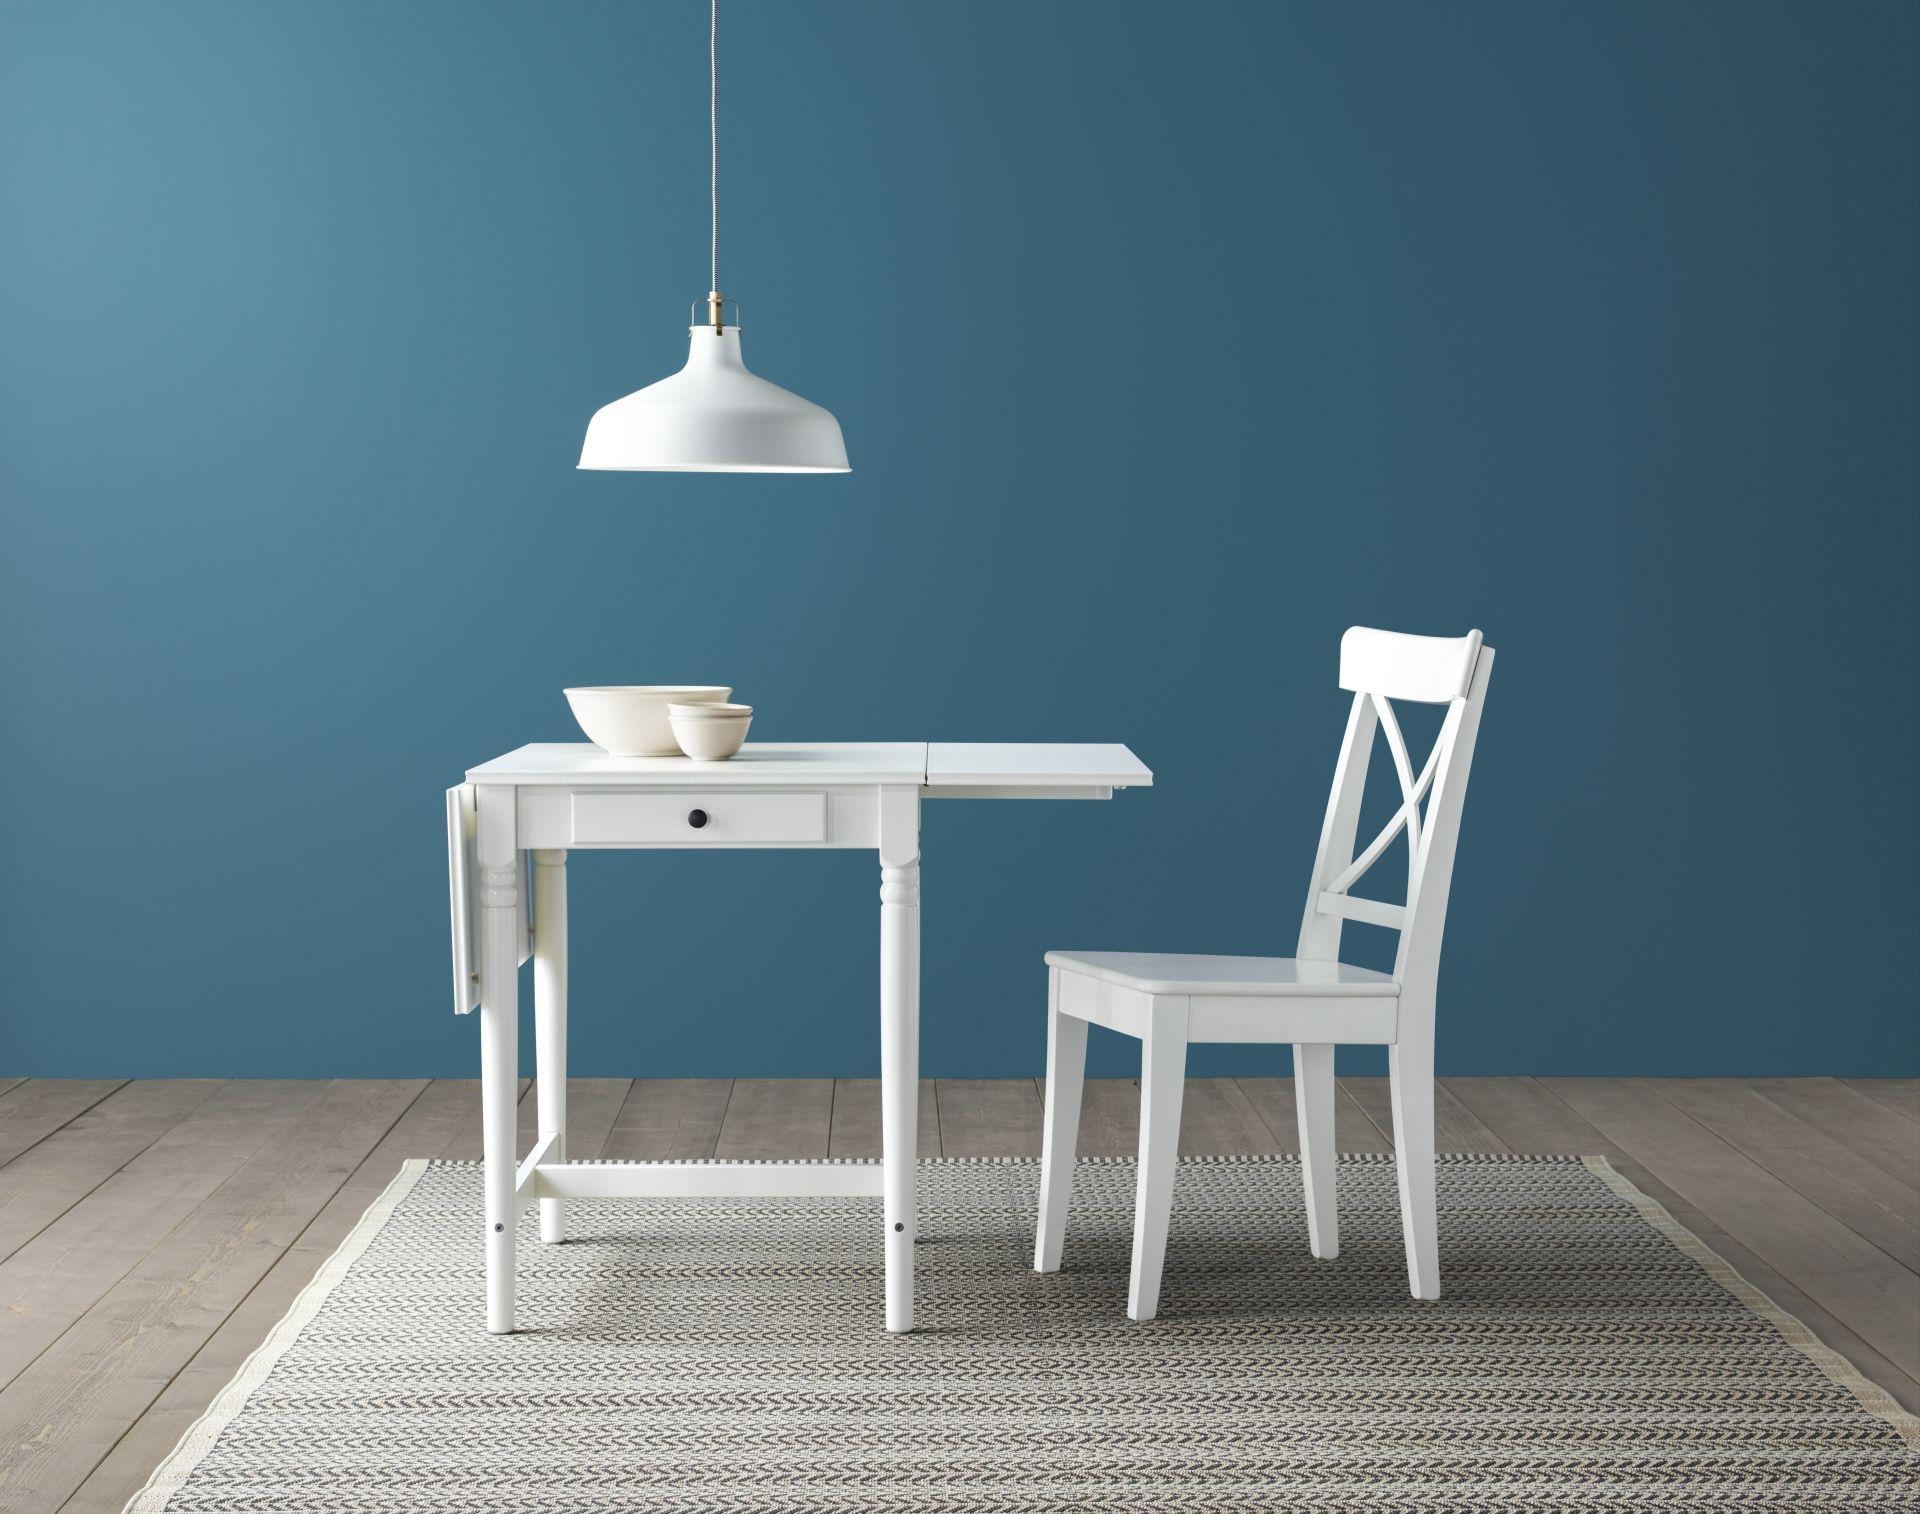 Ikea Witte Stoel : Ingatorp klaptafel wit